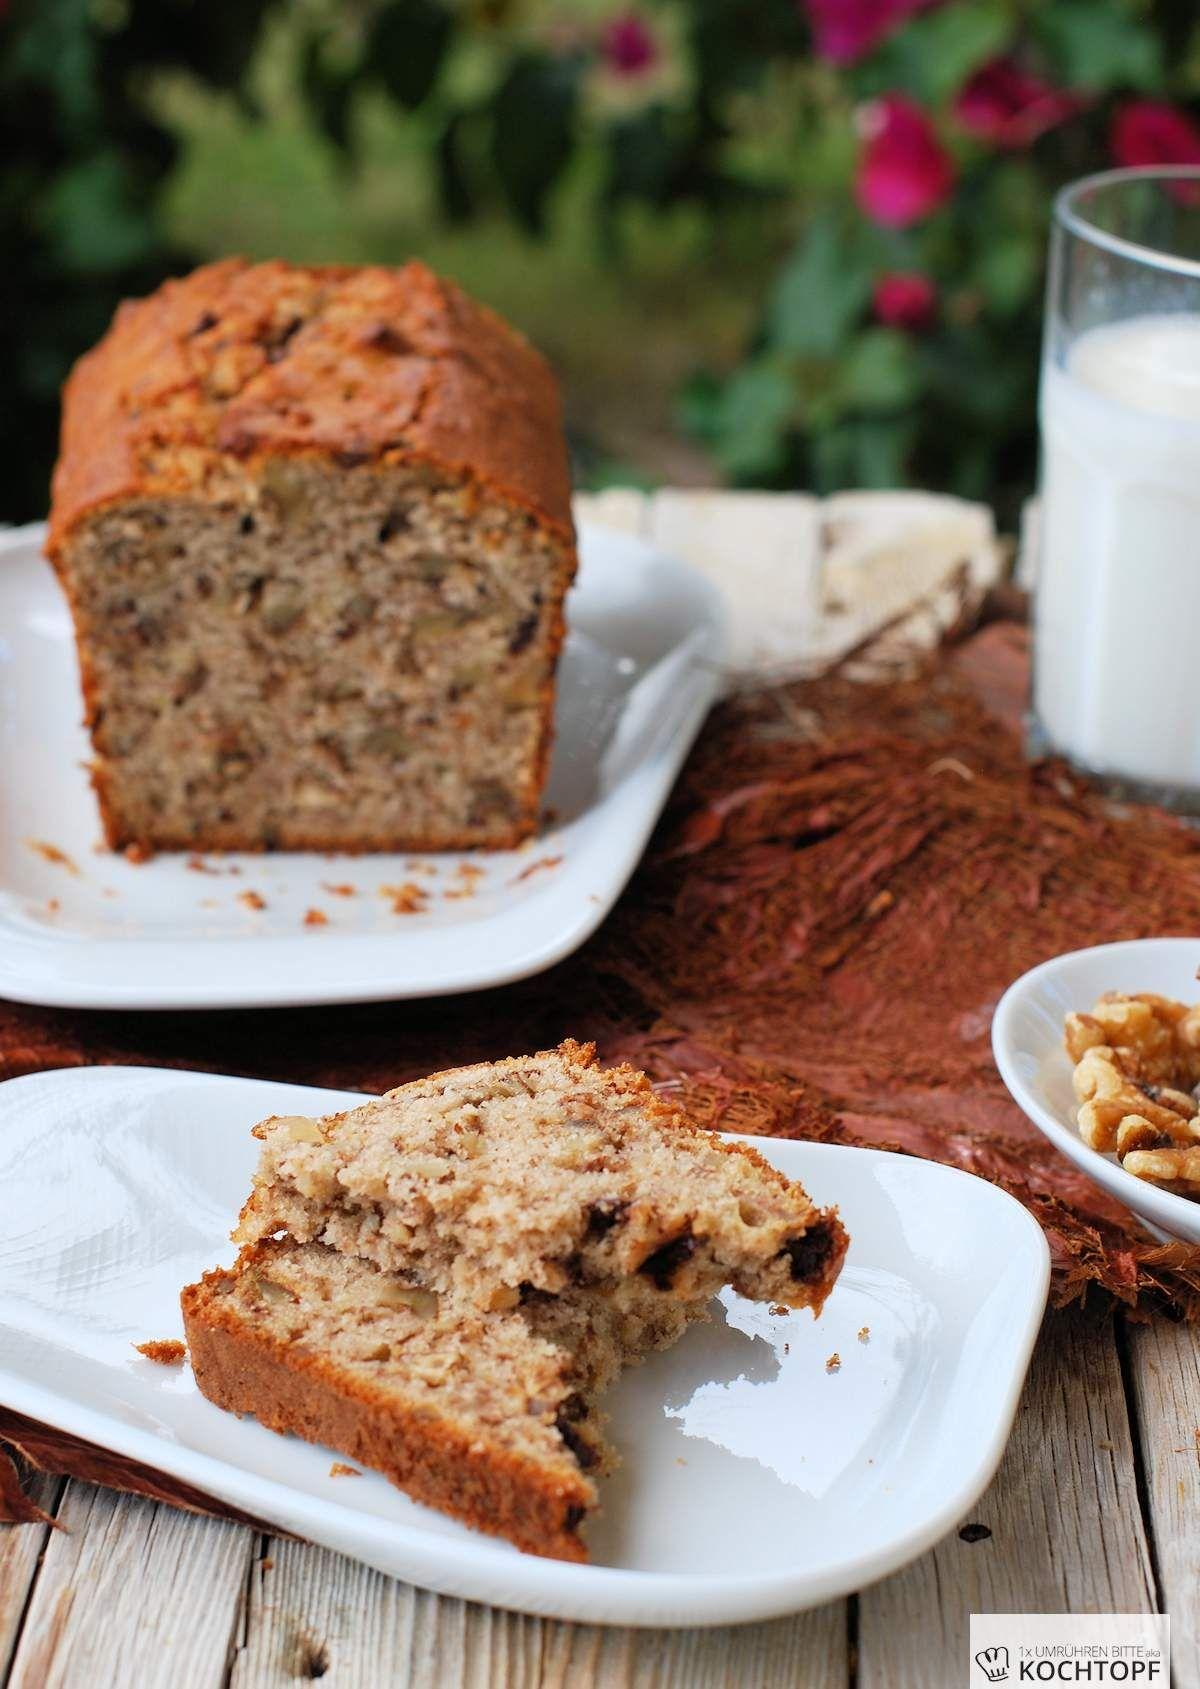 Walnuss-Schokoladen-Bananenbrot oder Banana Bread ist doch gar kein Brot!